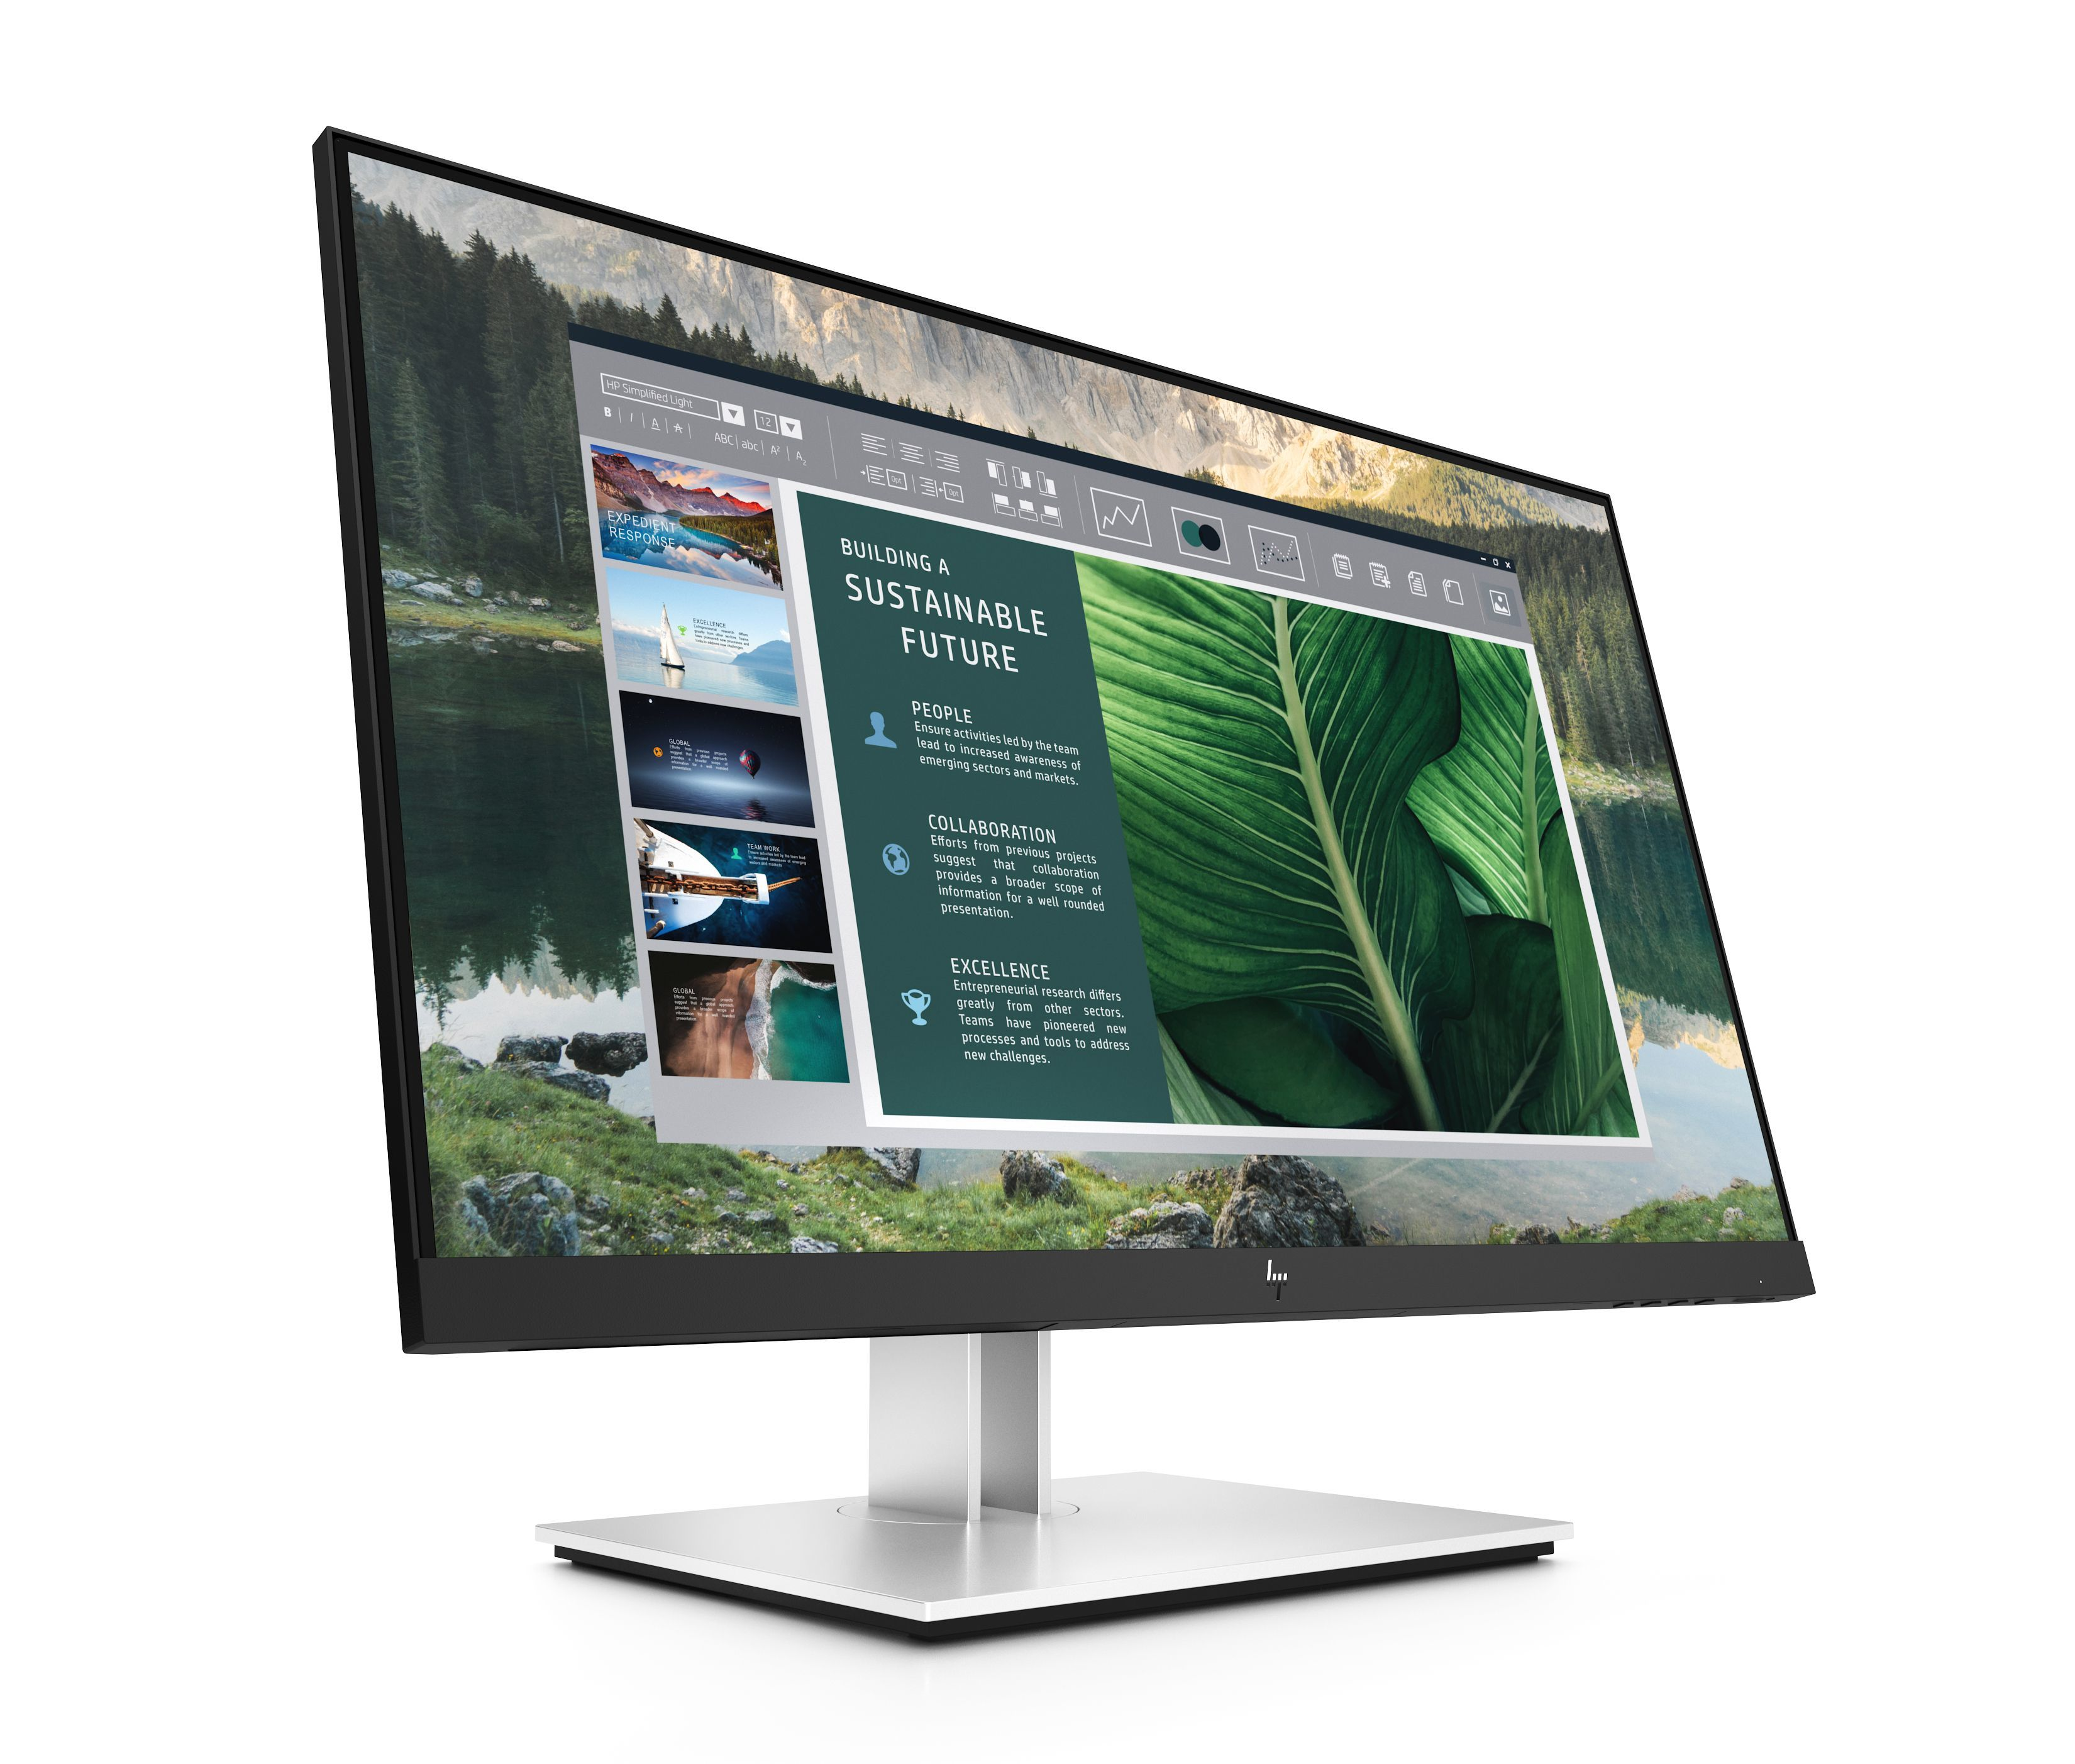 HP E系列顯示器